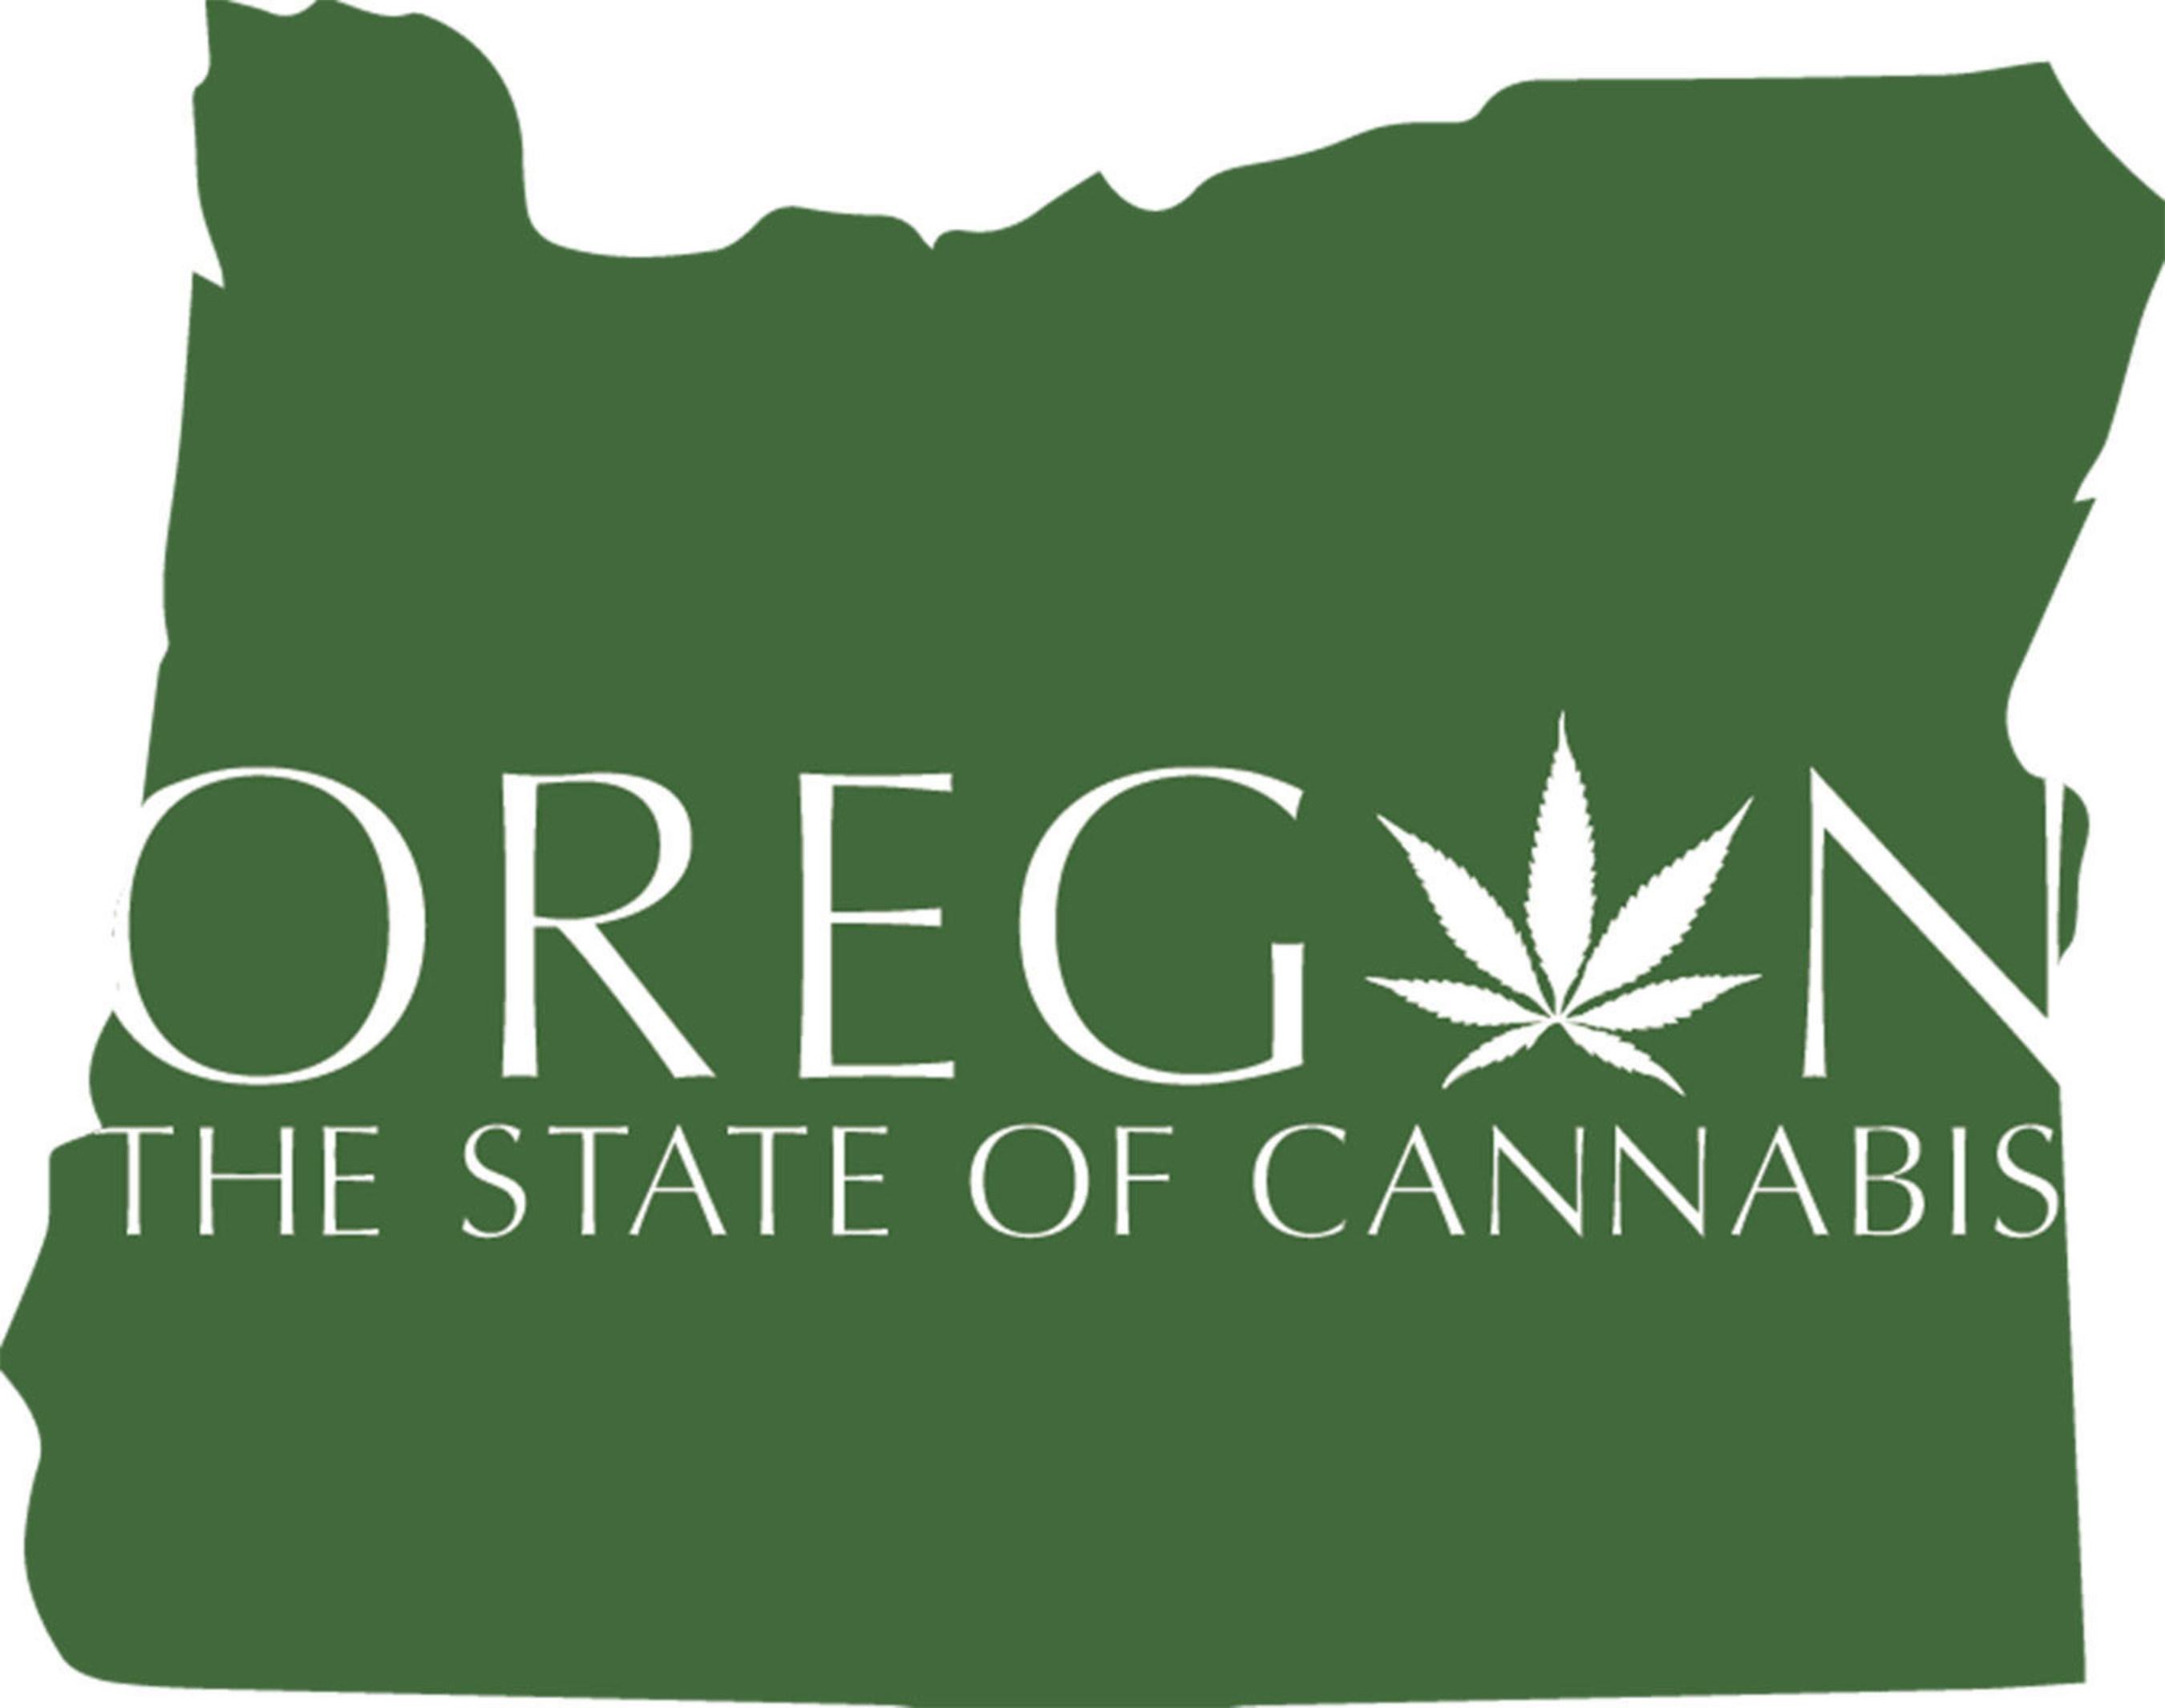 Studio McDermott Debuts Kickstarter Project to Fund In-Depth Look at Oregon's Emerging Cannabis Industry